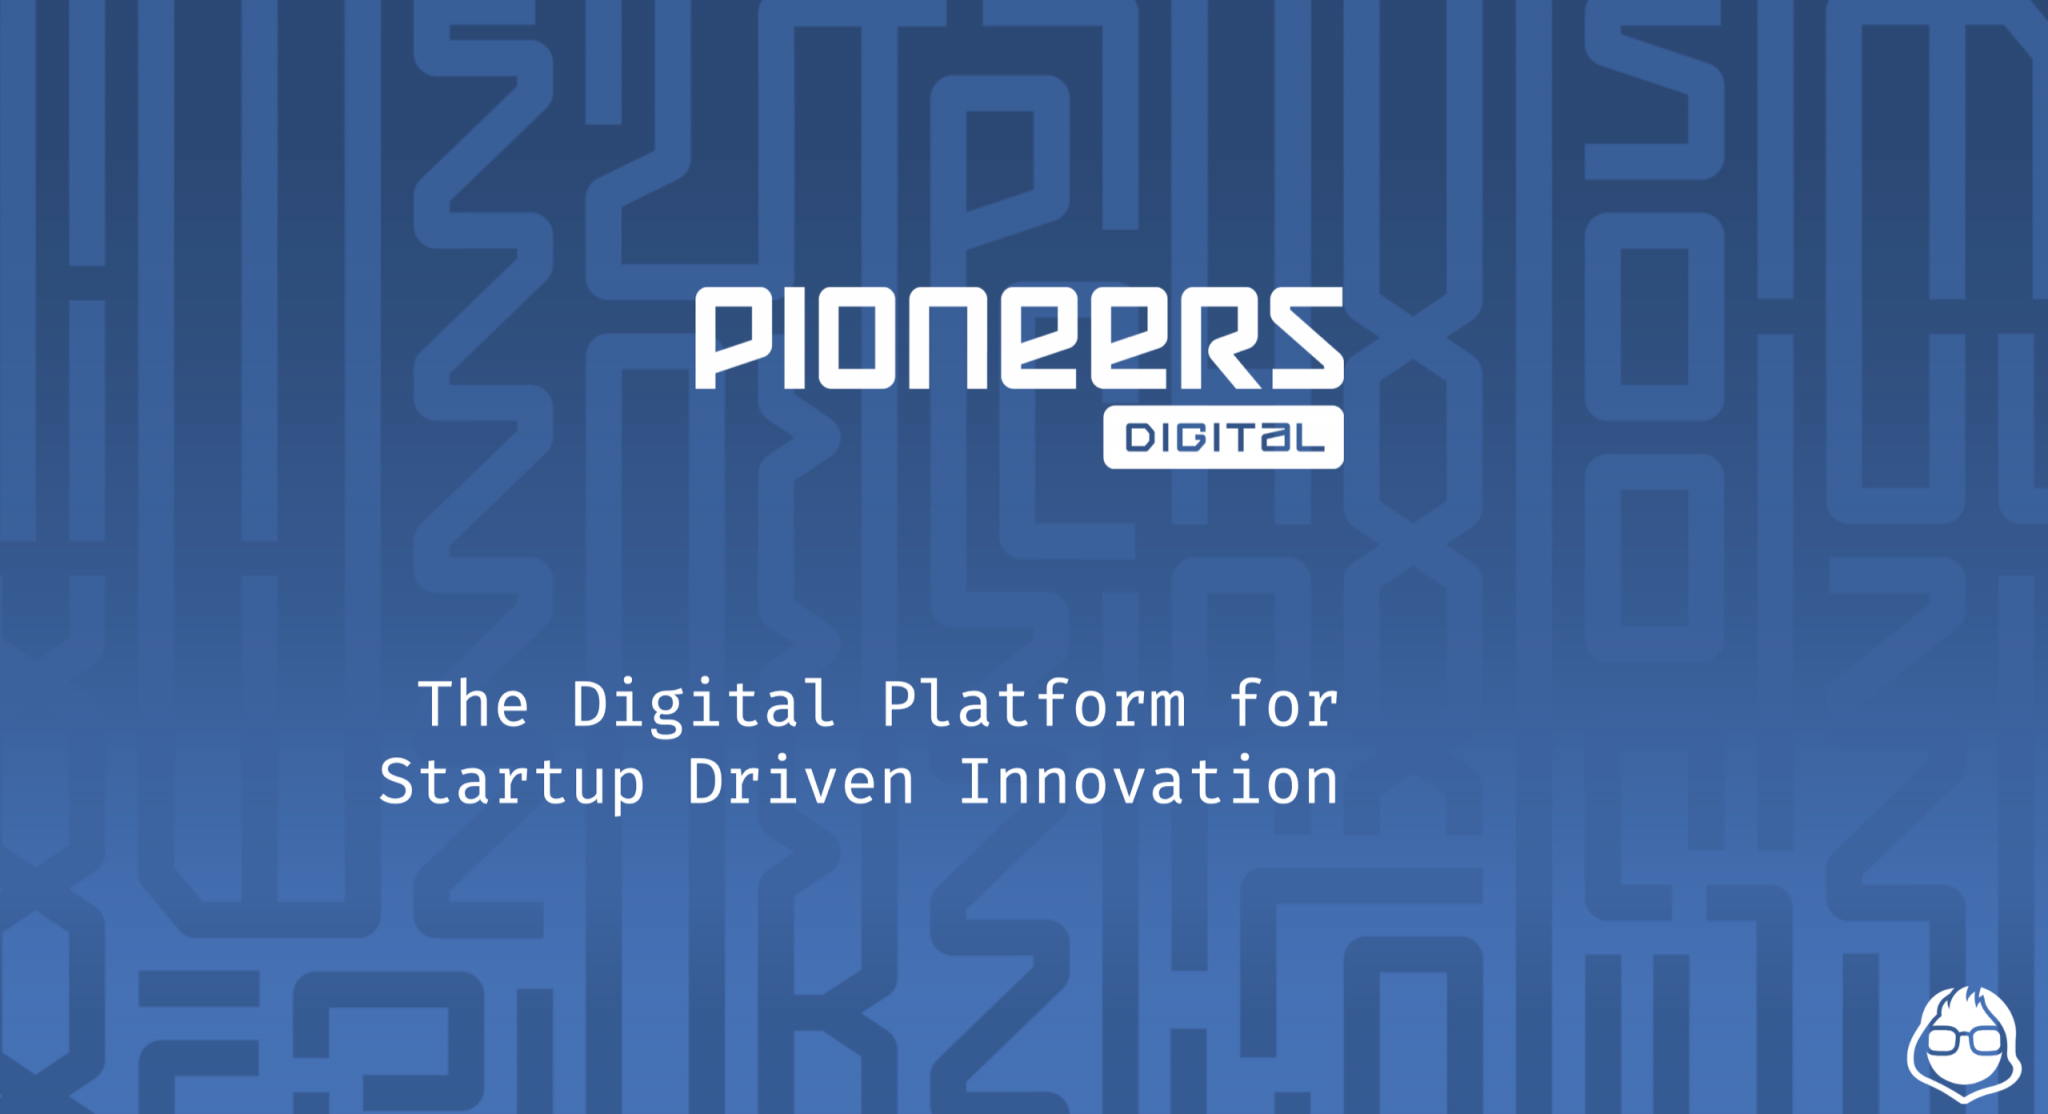 DealMatrix migriert zu Pioneers Digital